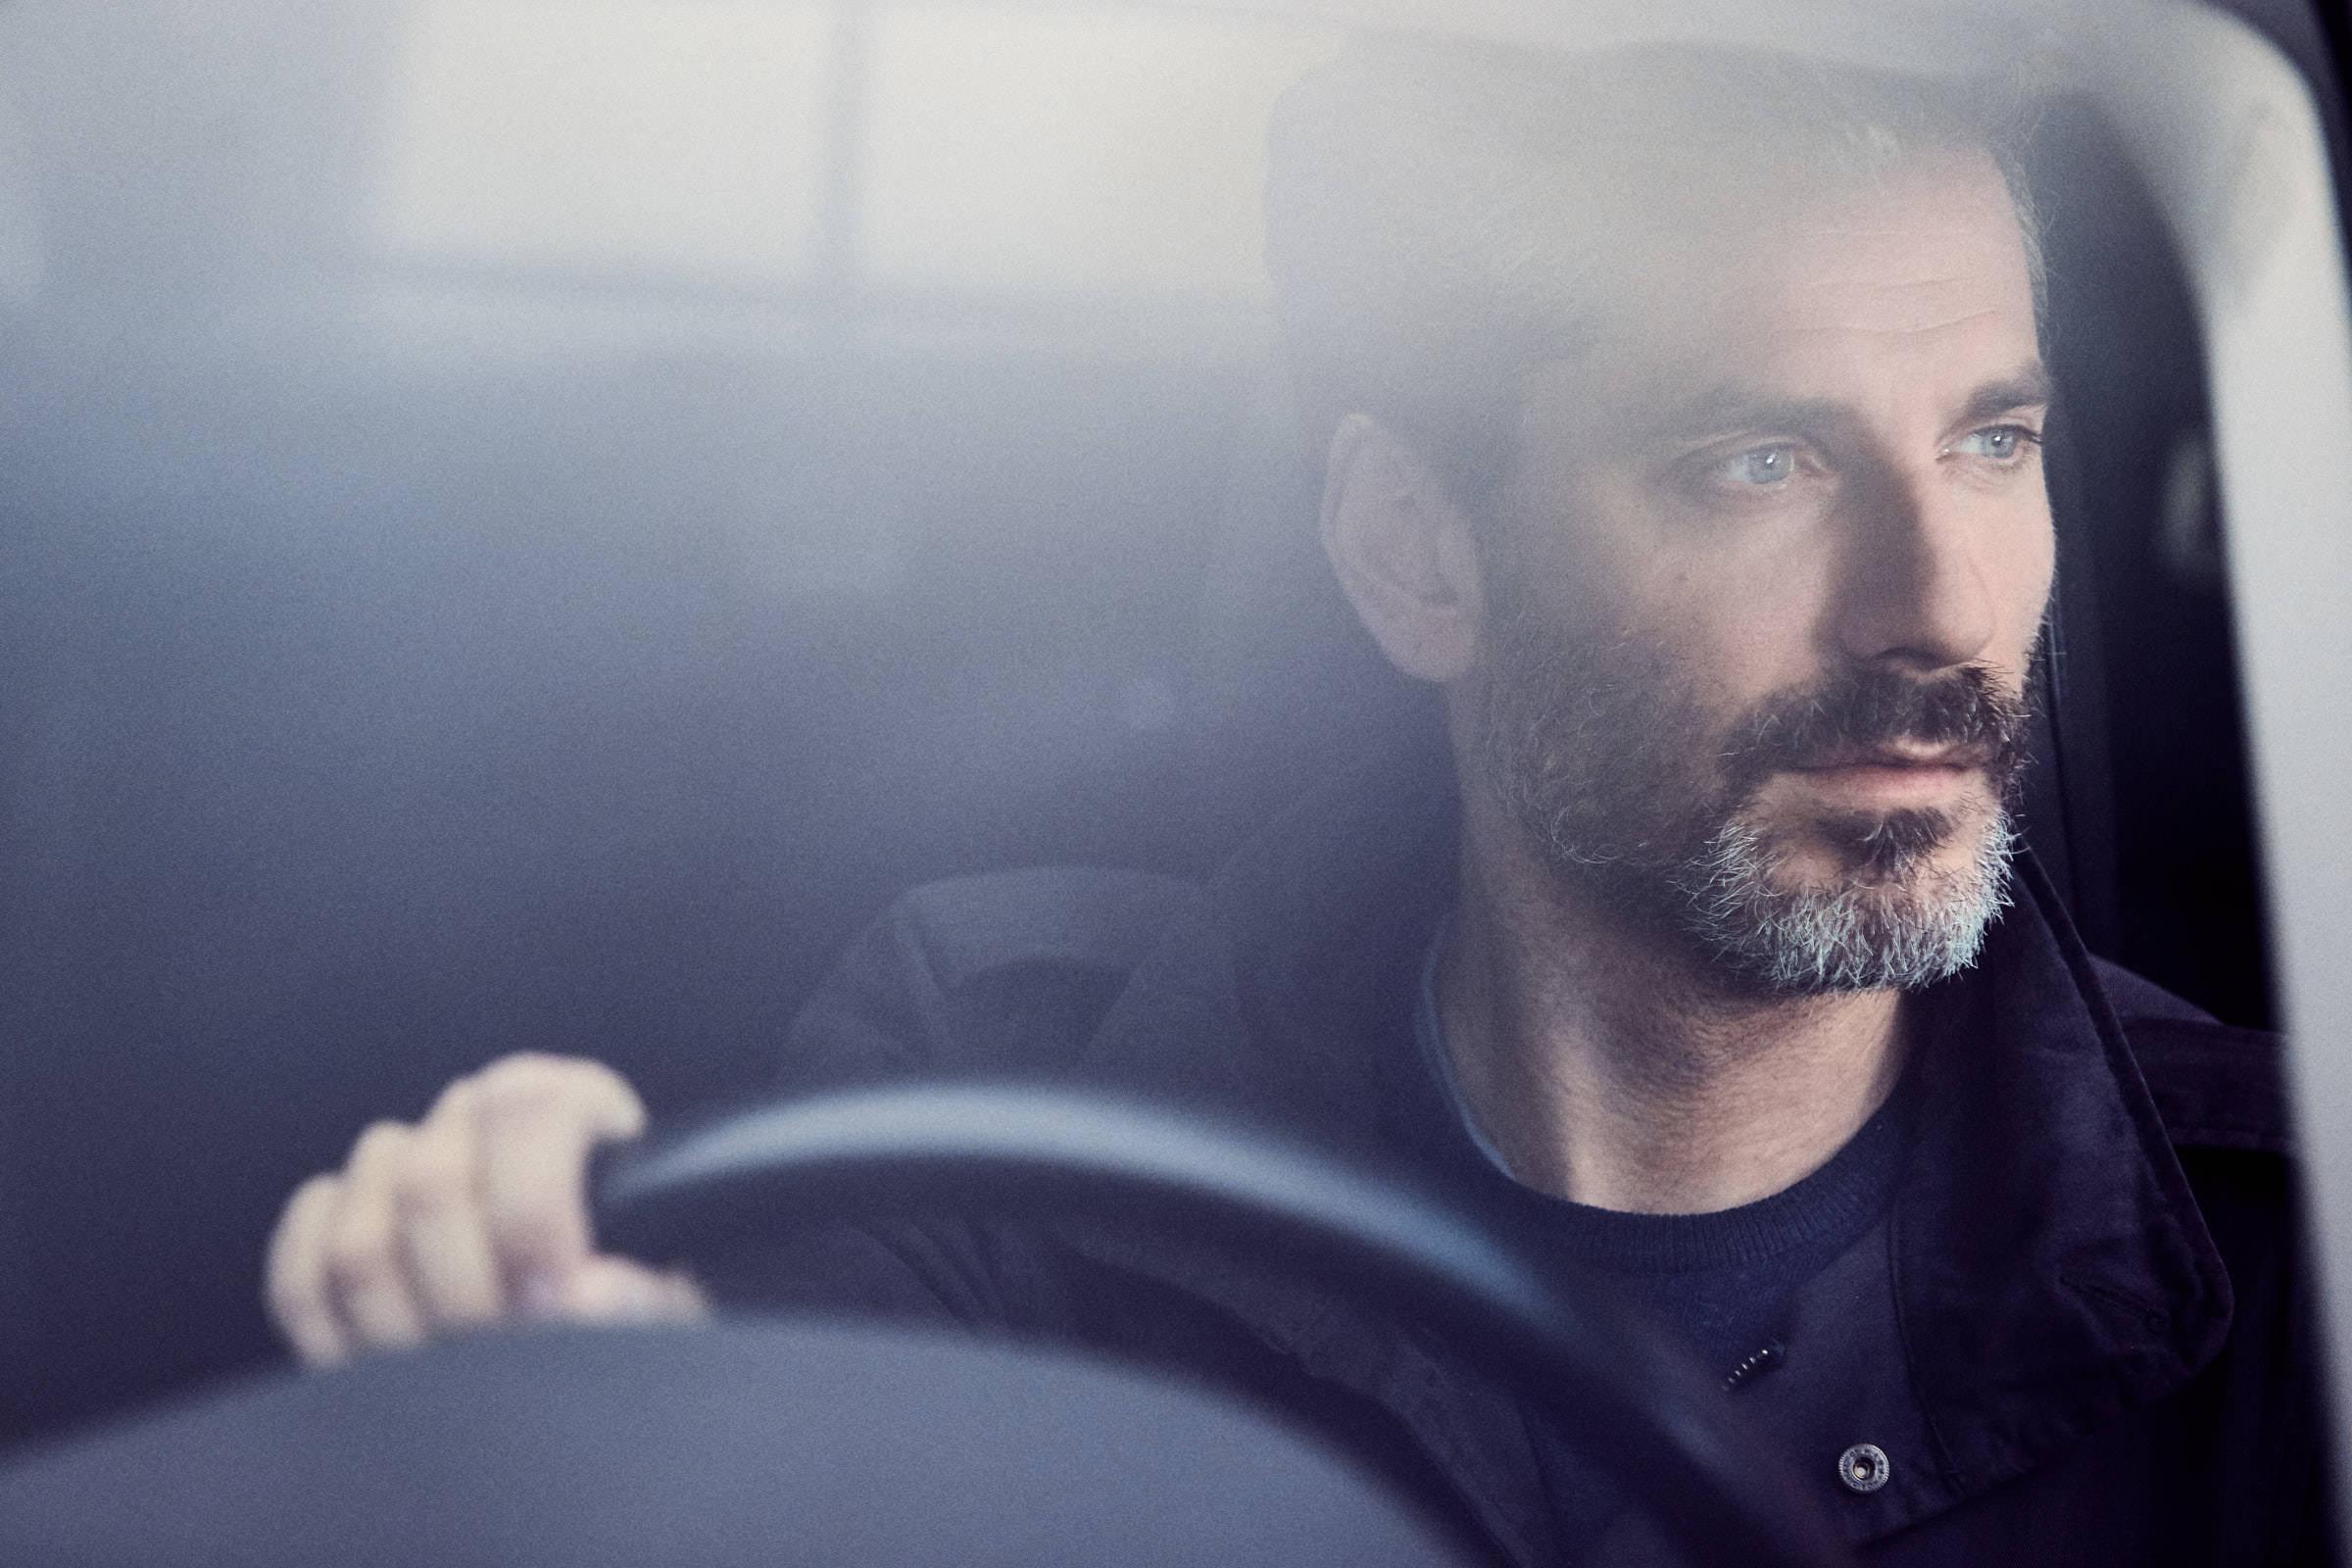 Portfolio_366_Portrait of Jens Lapidus_Volvo Cars_DSC4778___KRISTOFER SAMUELSSON PHOTOGRAPHY.jpg